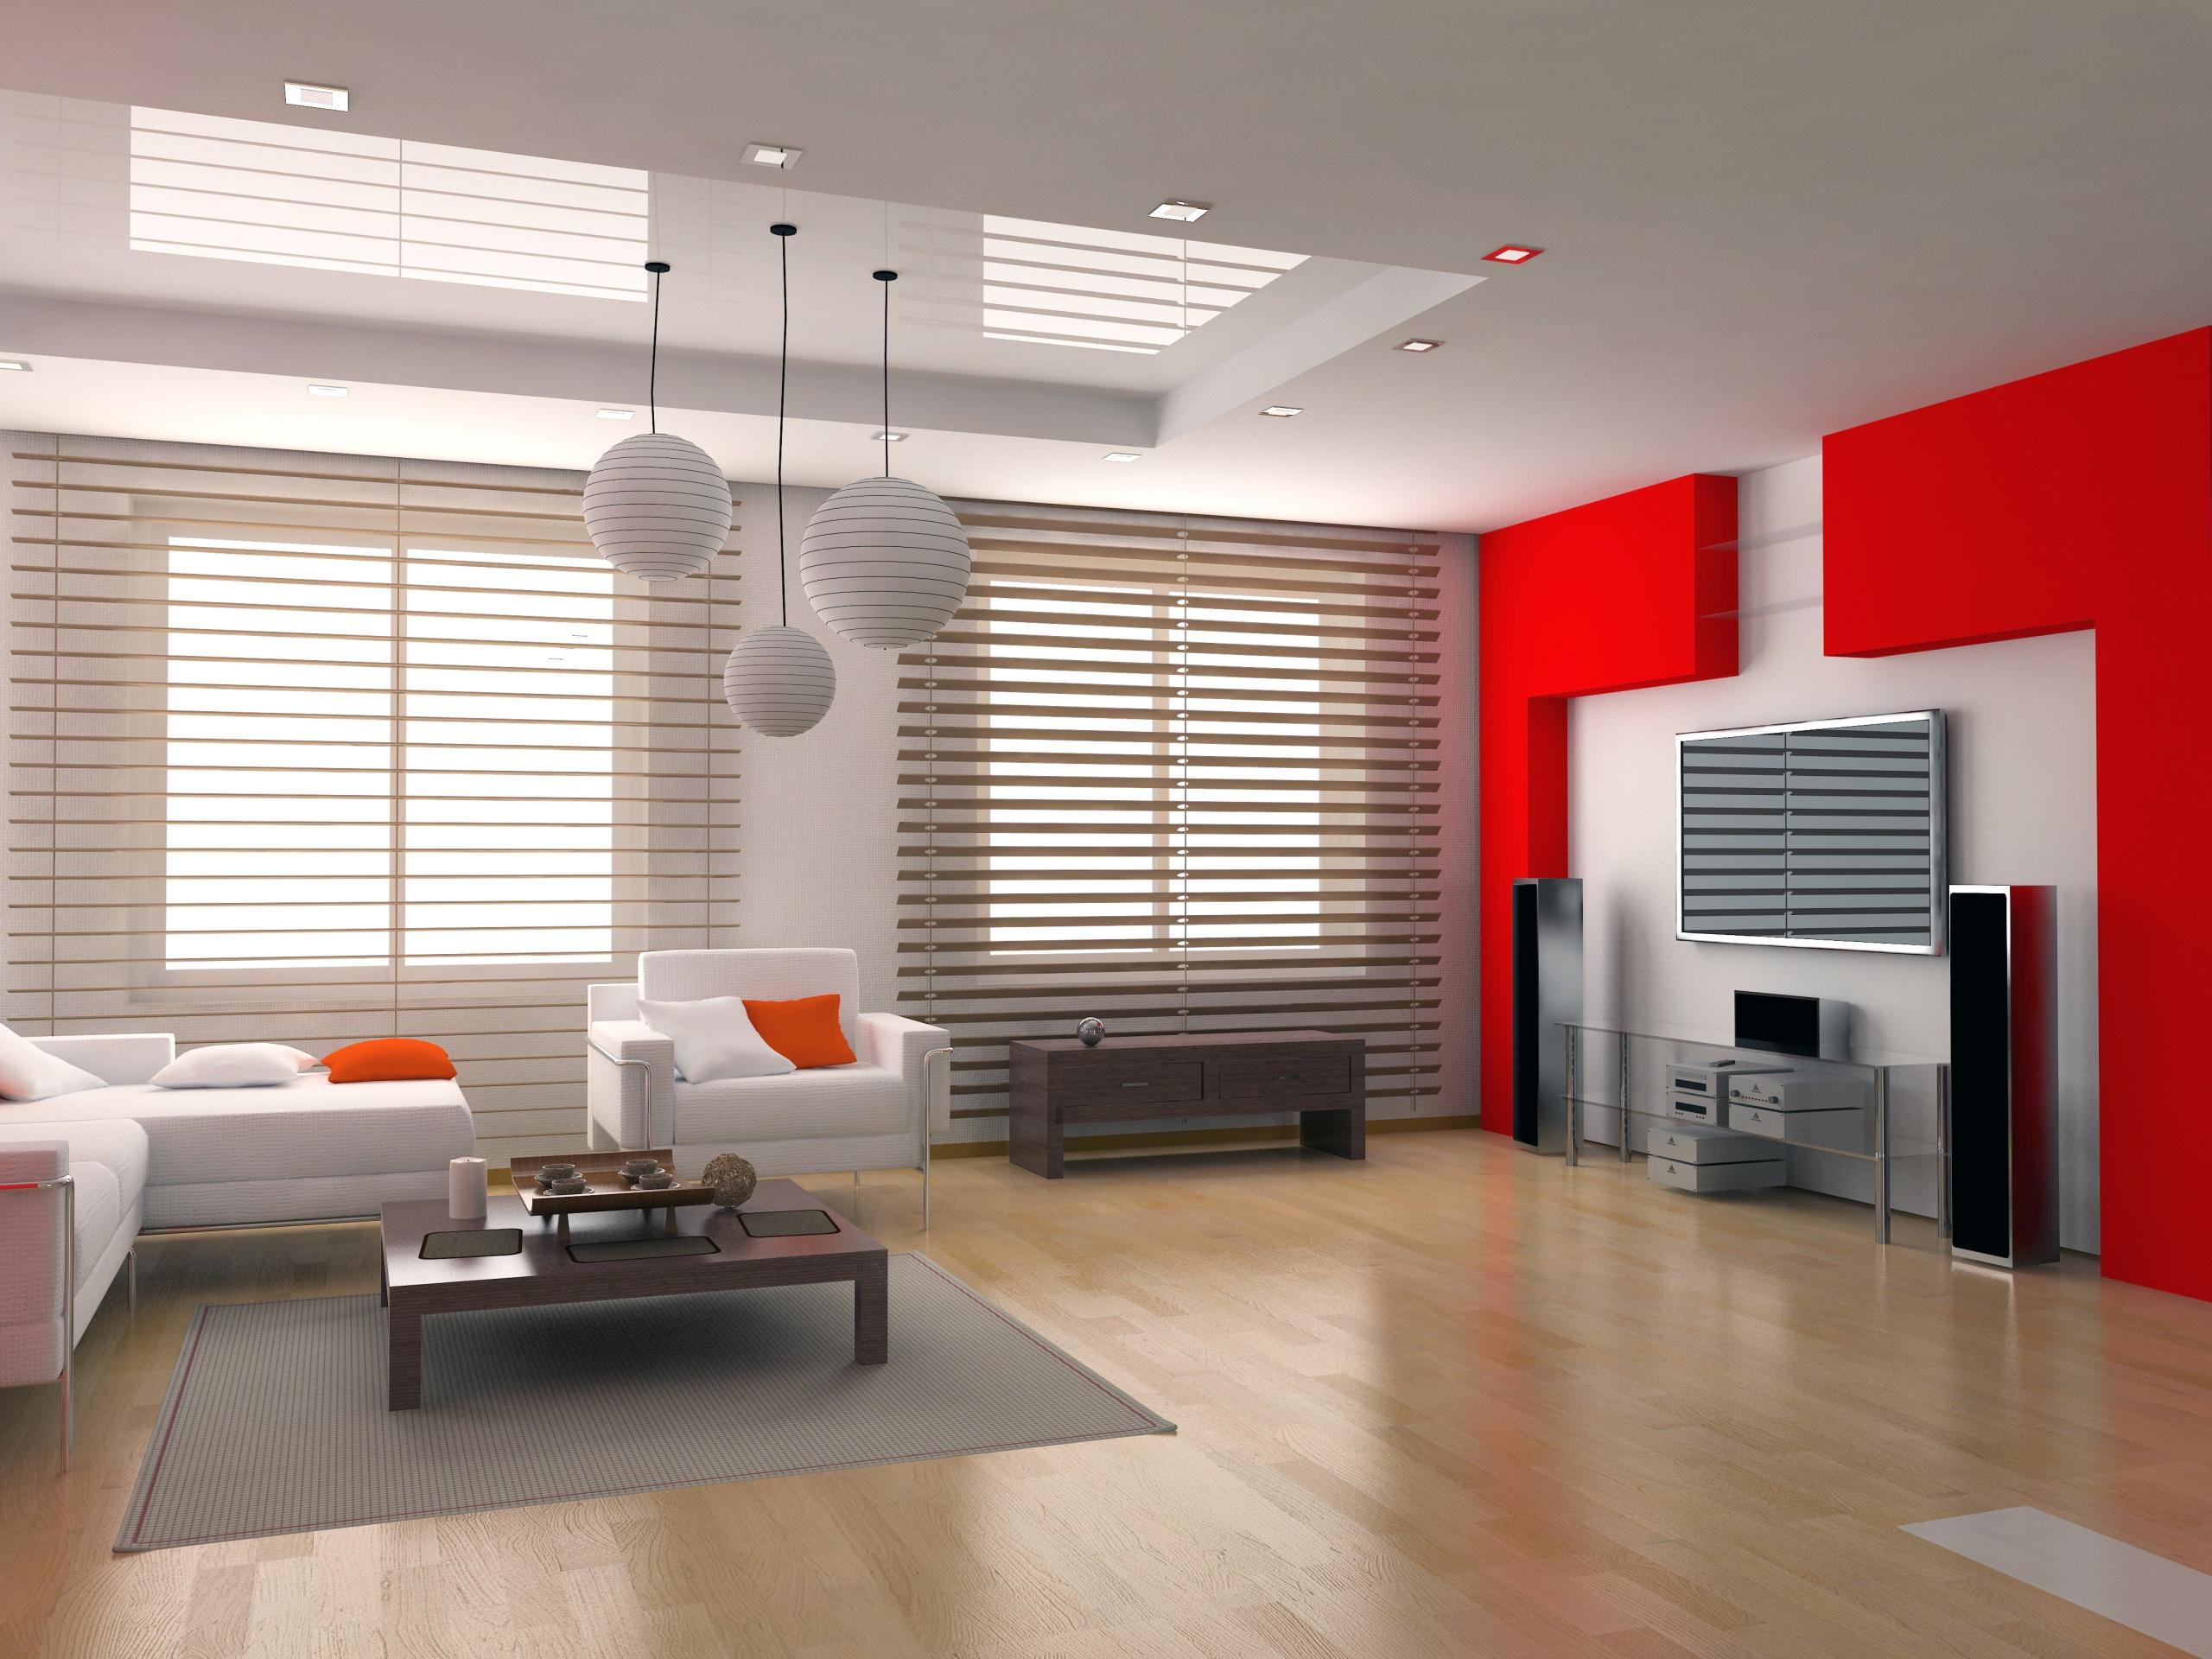 2560x1920 Beautiful furniture desktop PC and Mac wallpaper 2560x1920